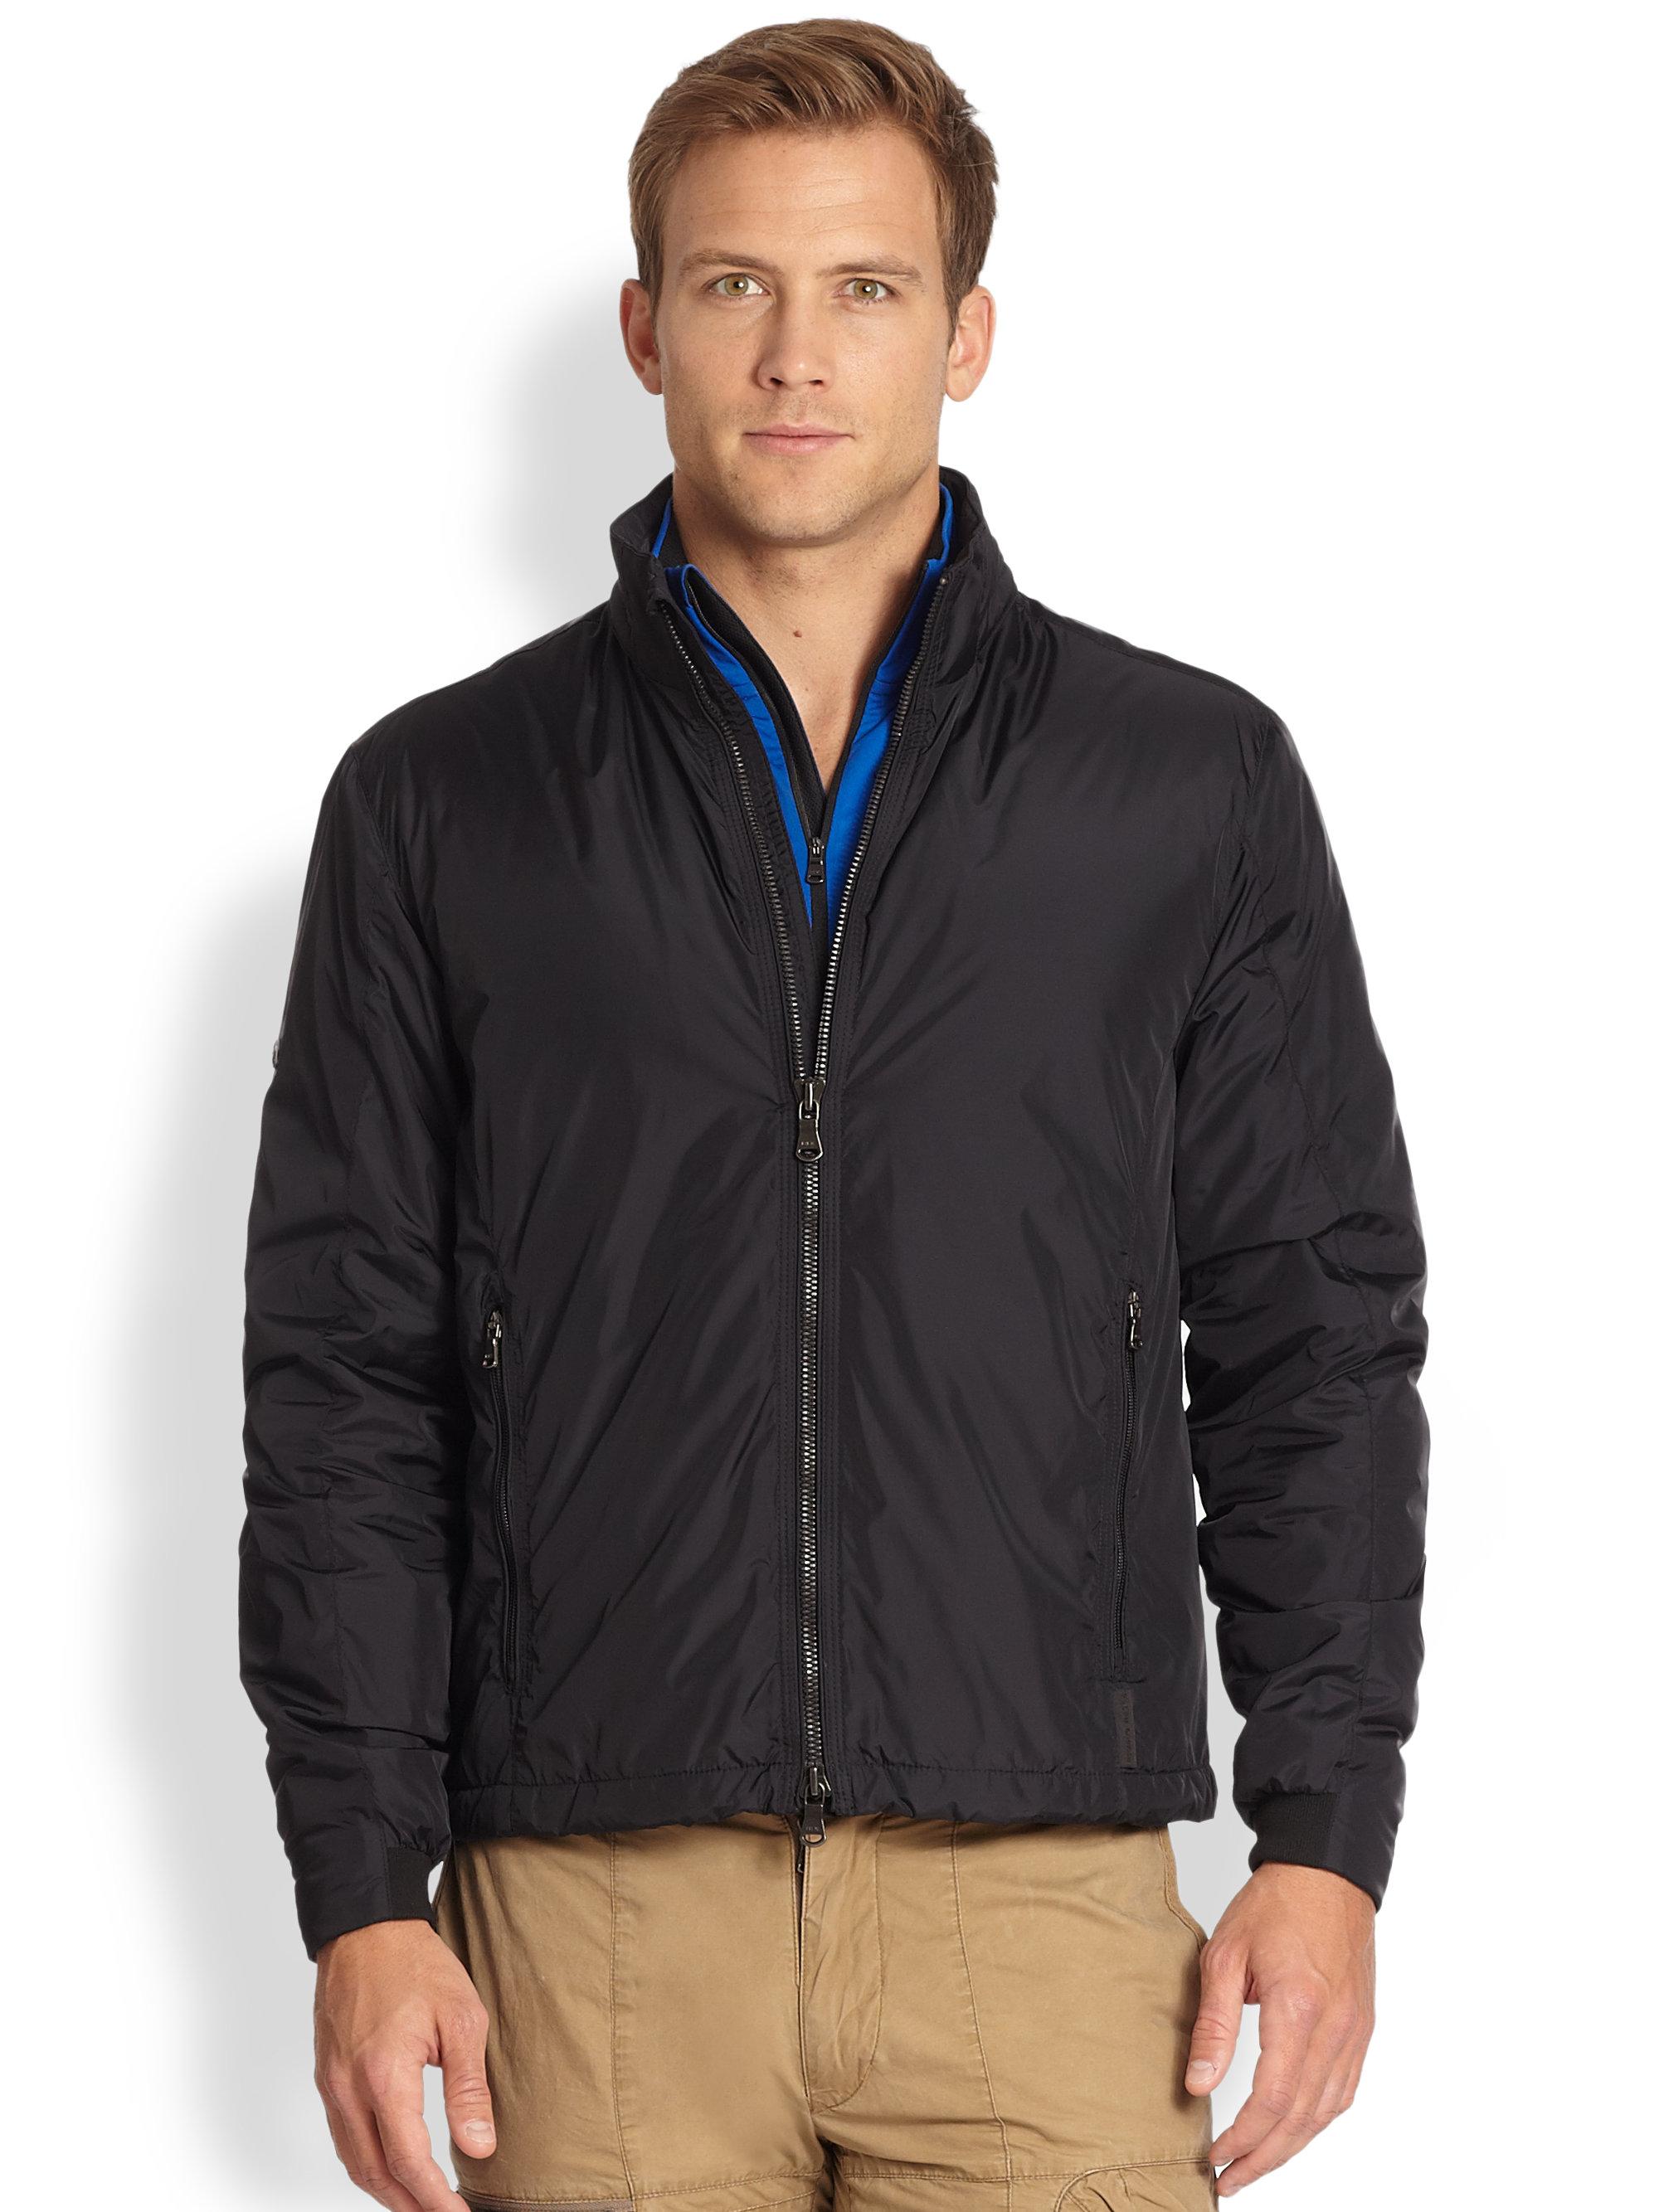 fedd9ee914c1 polo ralph lauren performance jacket · polo ralph lauren performance jacket  ...